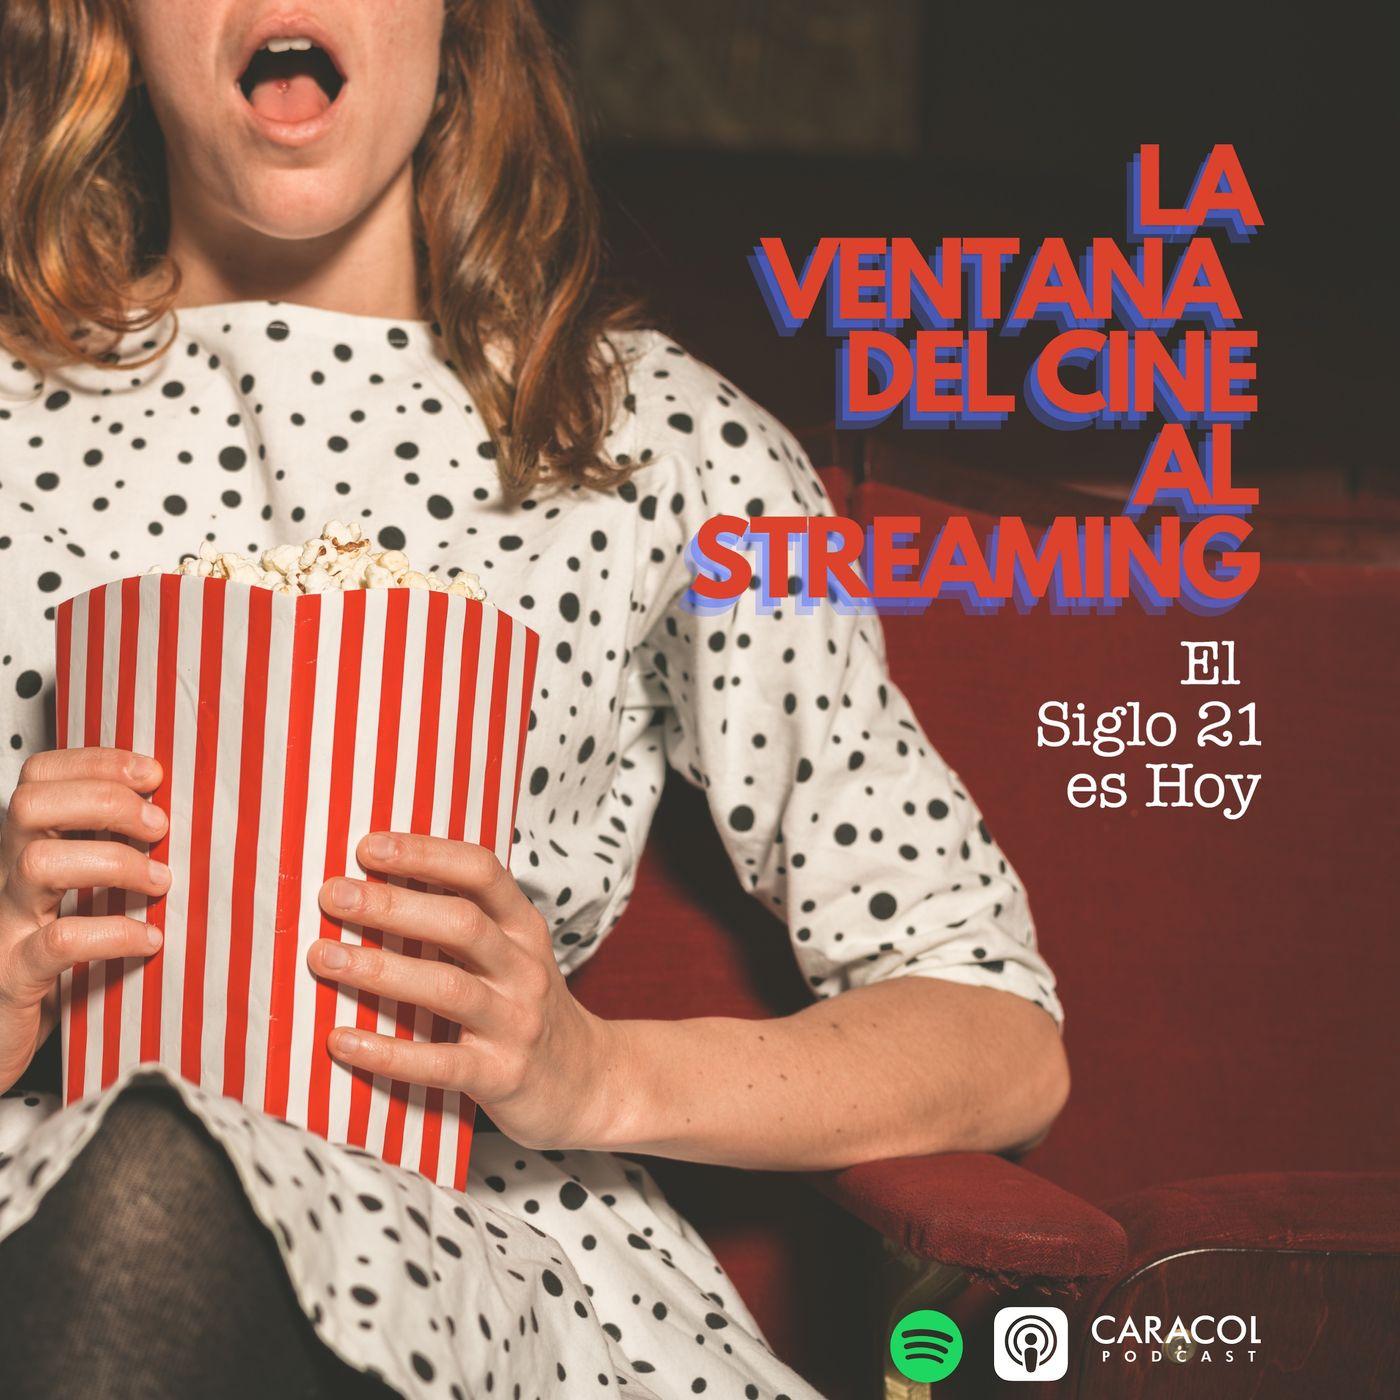 La ventana del cine al streaming